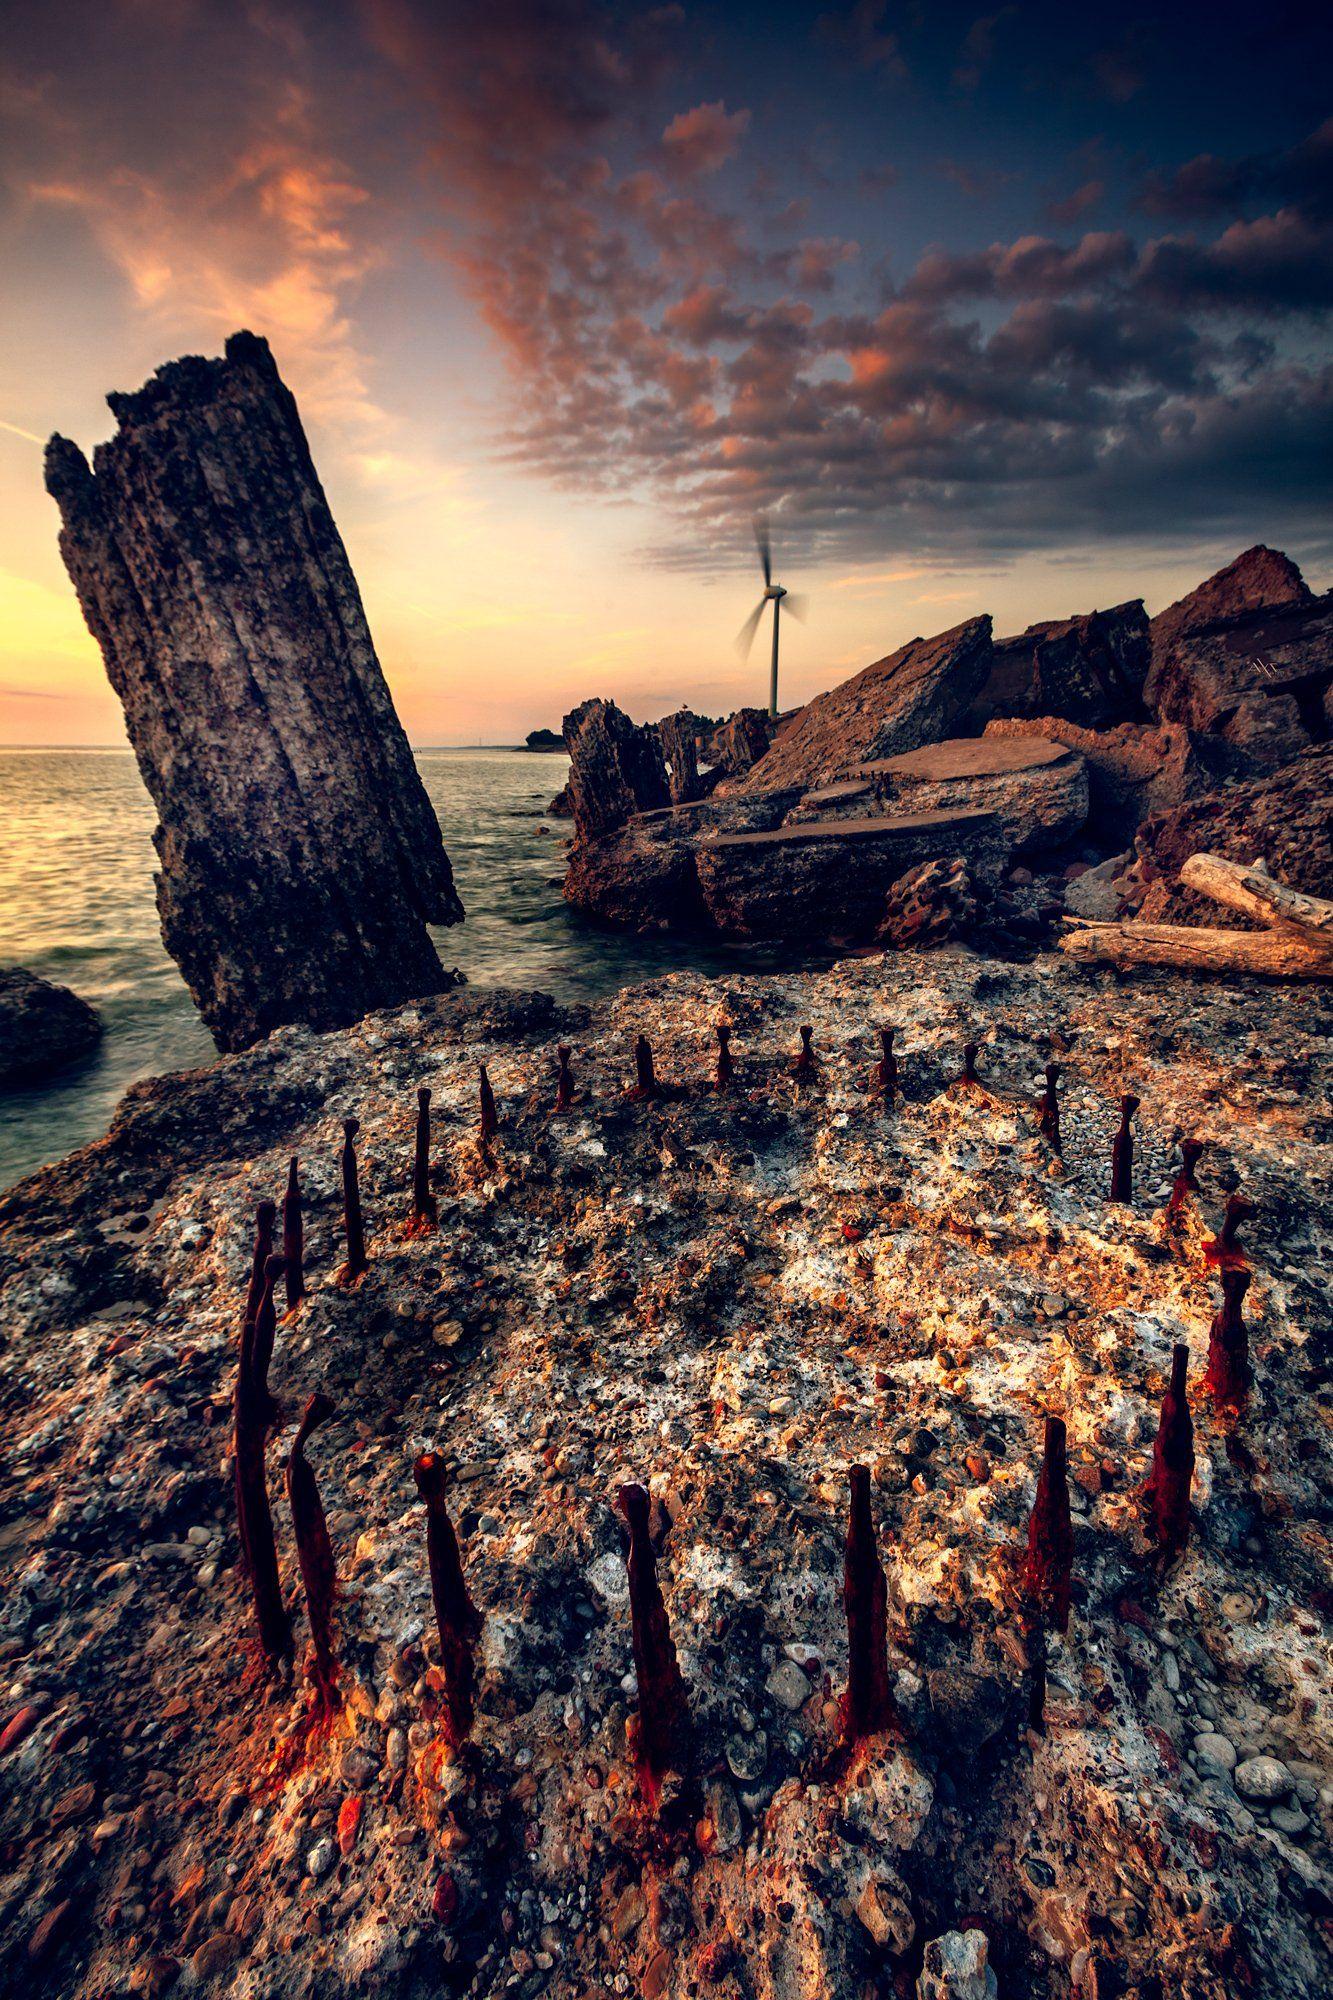 sunset, baltic sea, karosta, fortifications, Руслан Болгов (Axe)